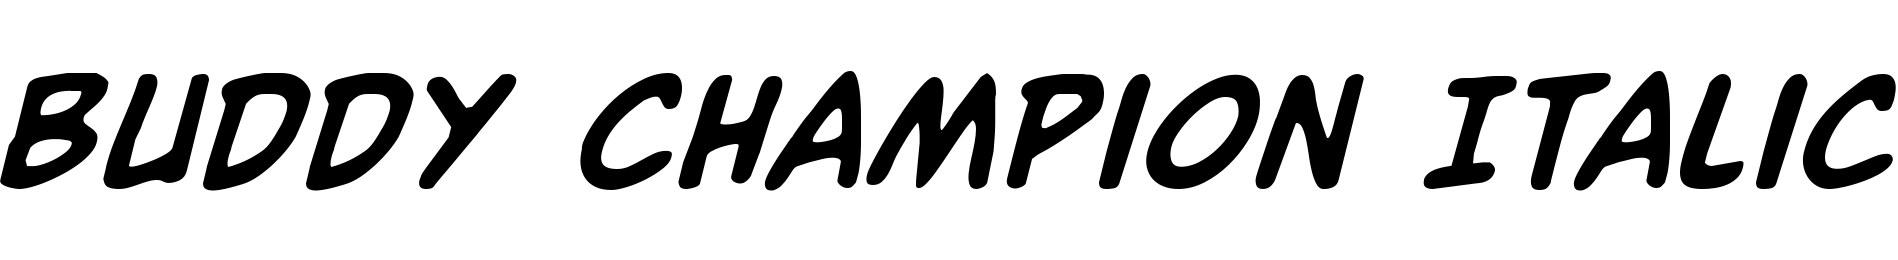 Buddy Champion Italic